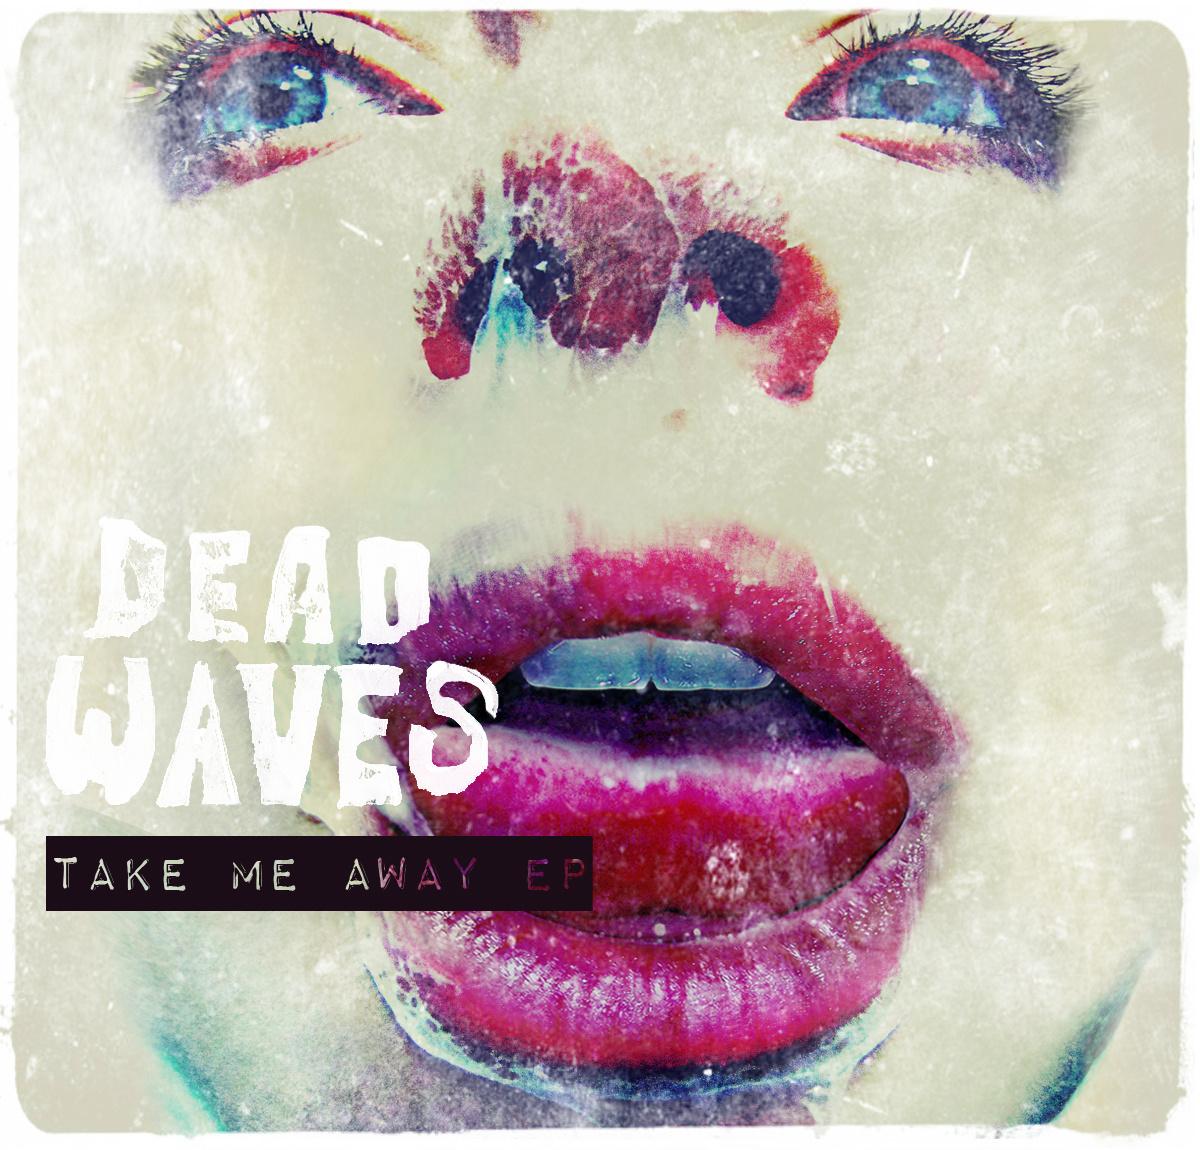 Dead Waves - Take Me Away EP